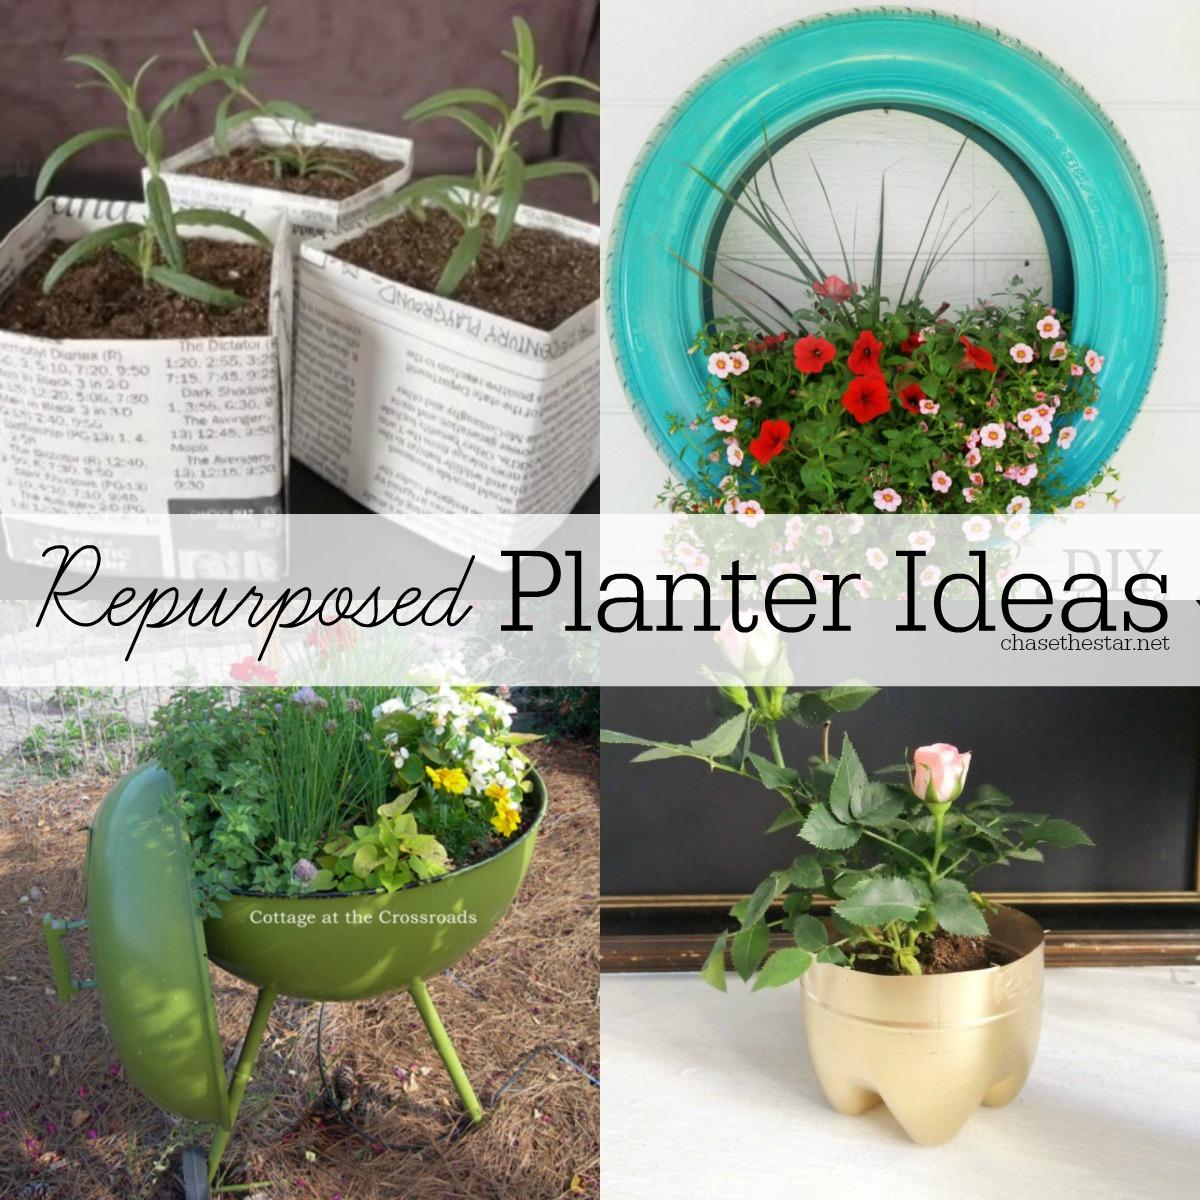 Repurposed Planter Ideas – Dan330